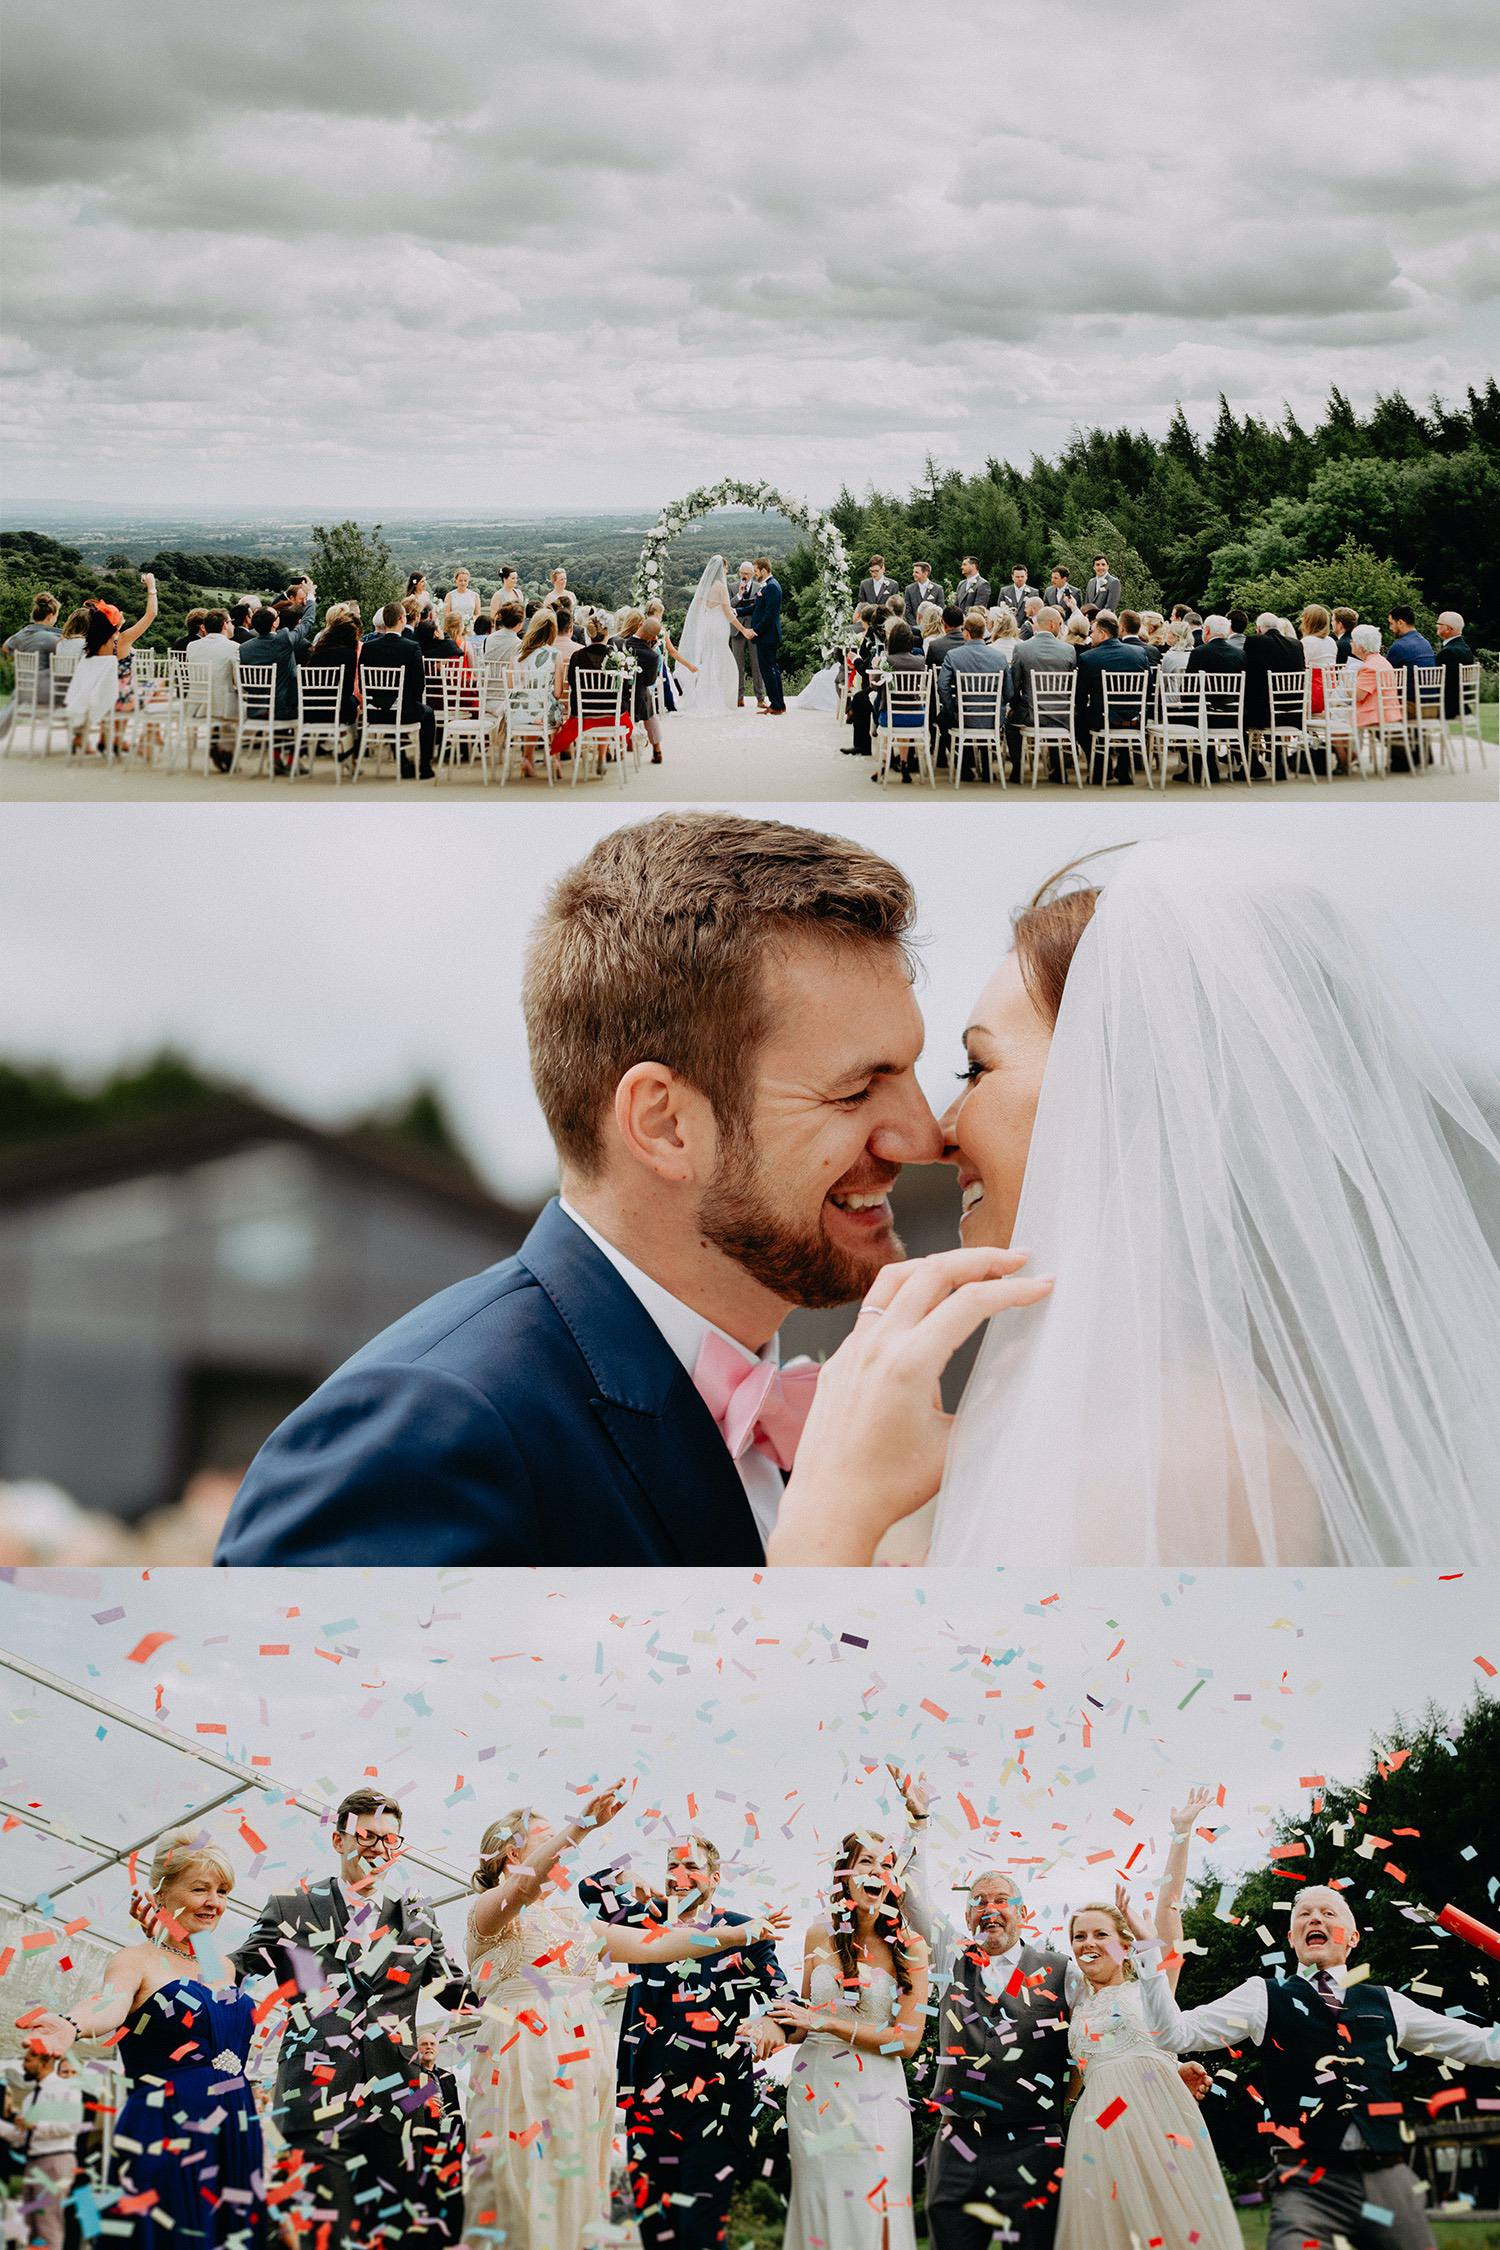 Wedding-Photographer-Natural-Retreats-Yorkshire-1.jpg